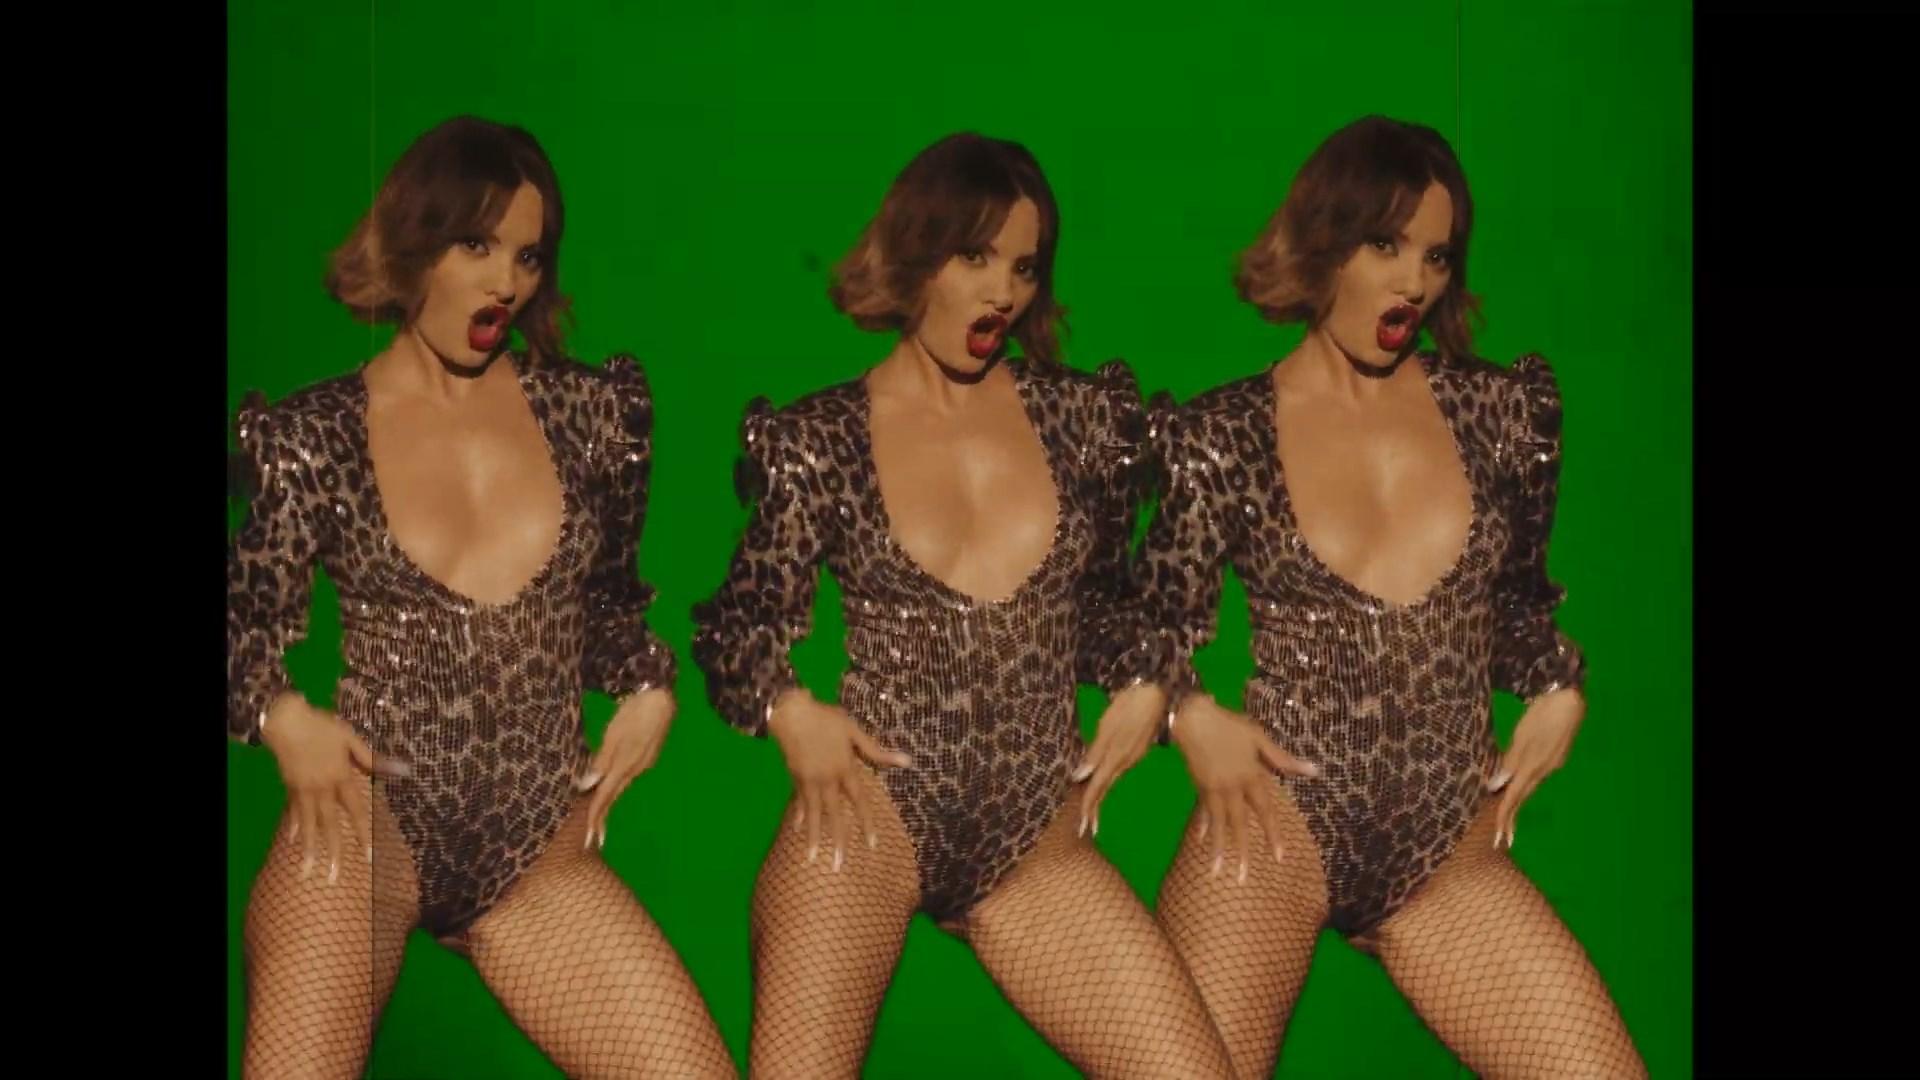 Alexandra Stan x NERVO - Come Into My World   Official Video.mp4_snapshot_02.40_[2021.07.03_03.05.53].jpg